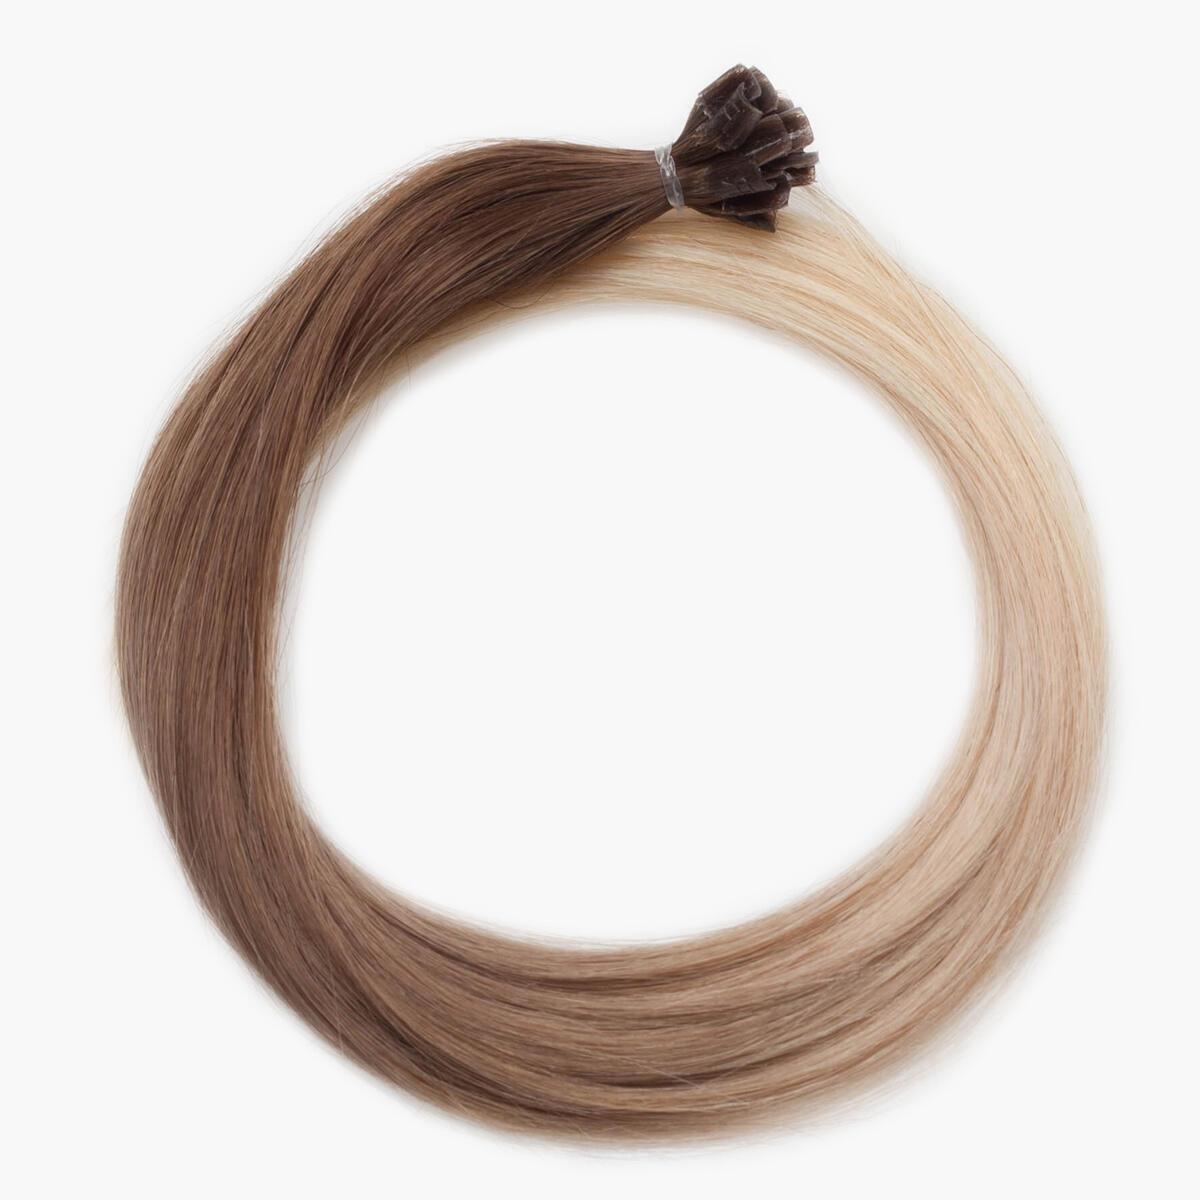 Nail Hair Original O5.1/10.8 Medium Ash Blond Ombre 40 cm